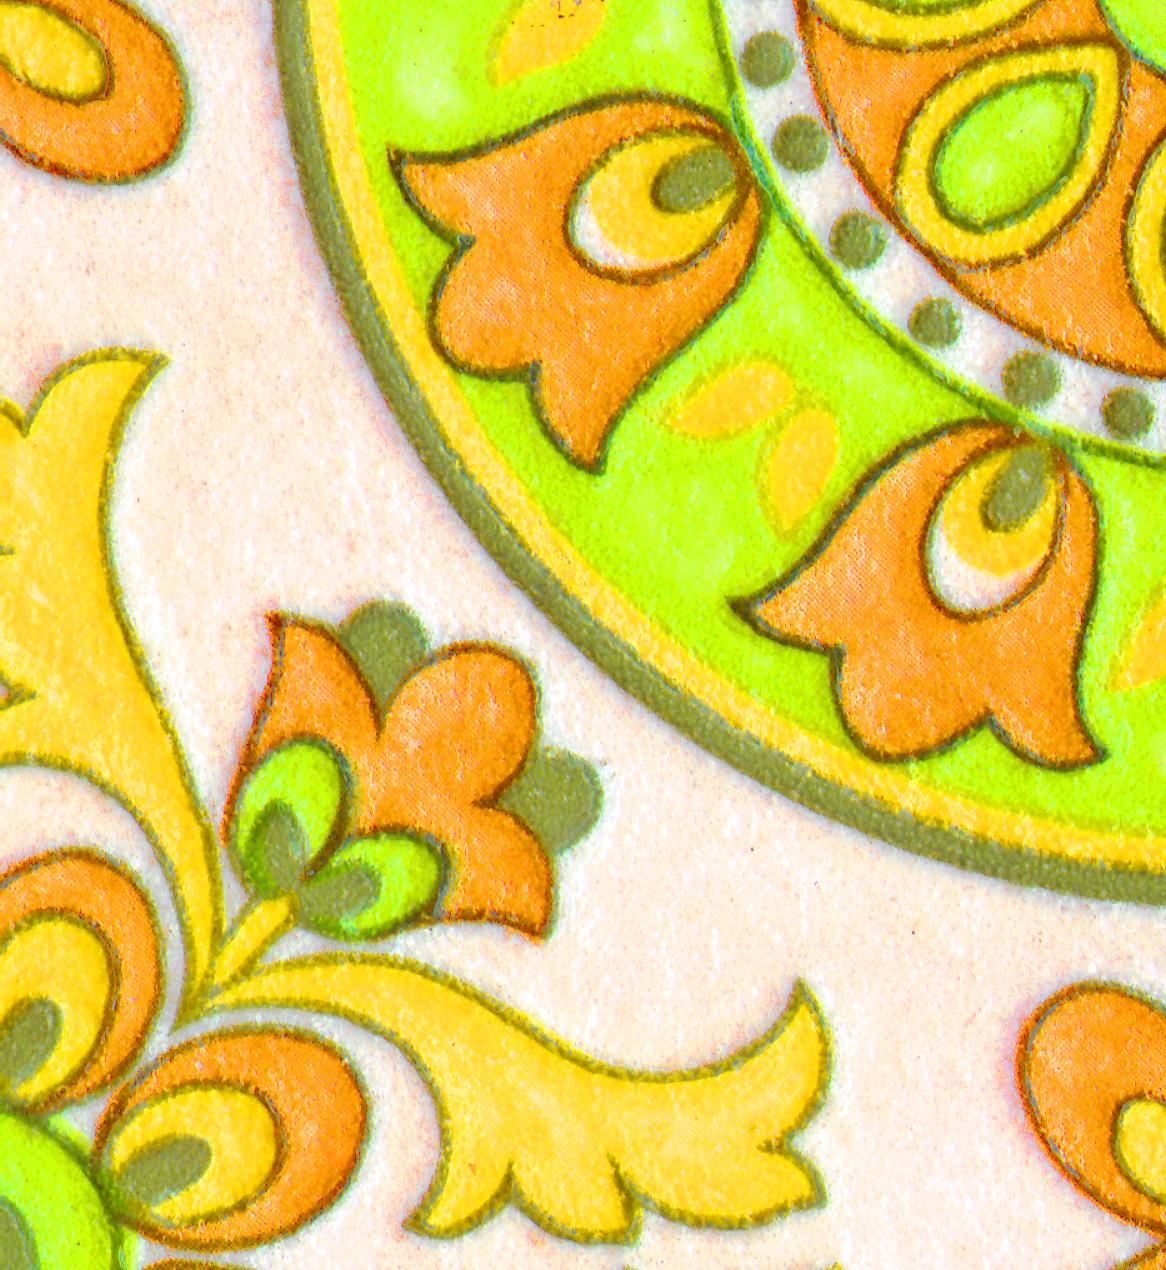 Papier Peint Adhesif Mural - Yeda Design Papier peint textile et vinyle adhésif